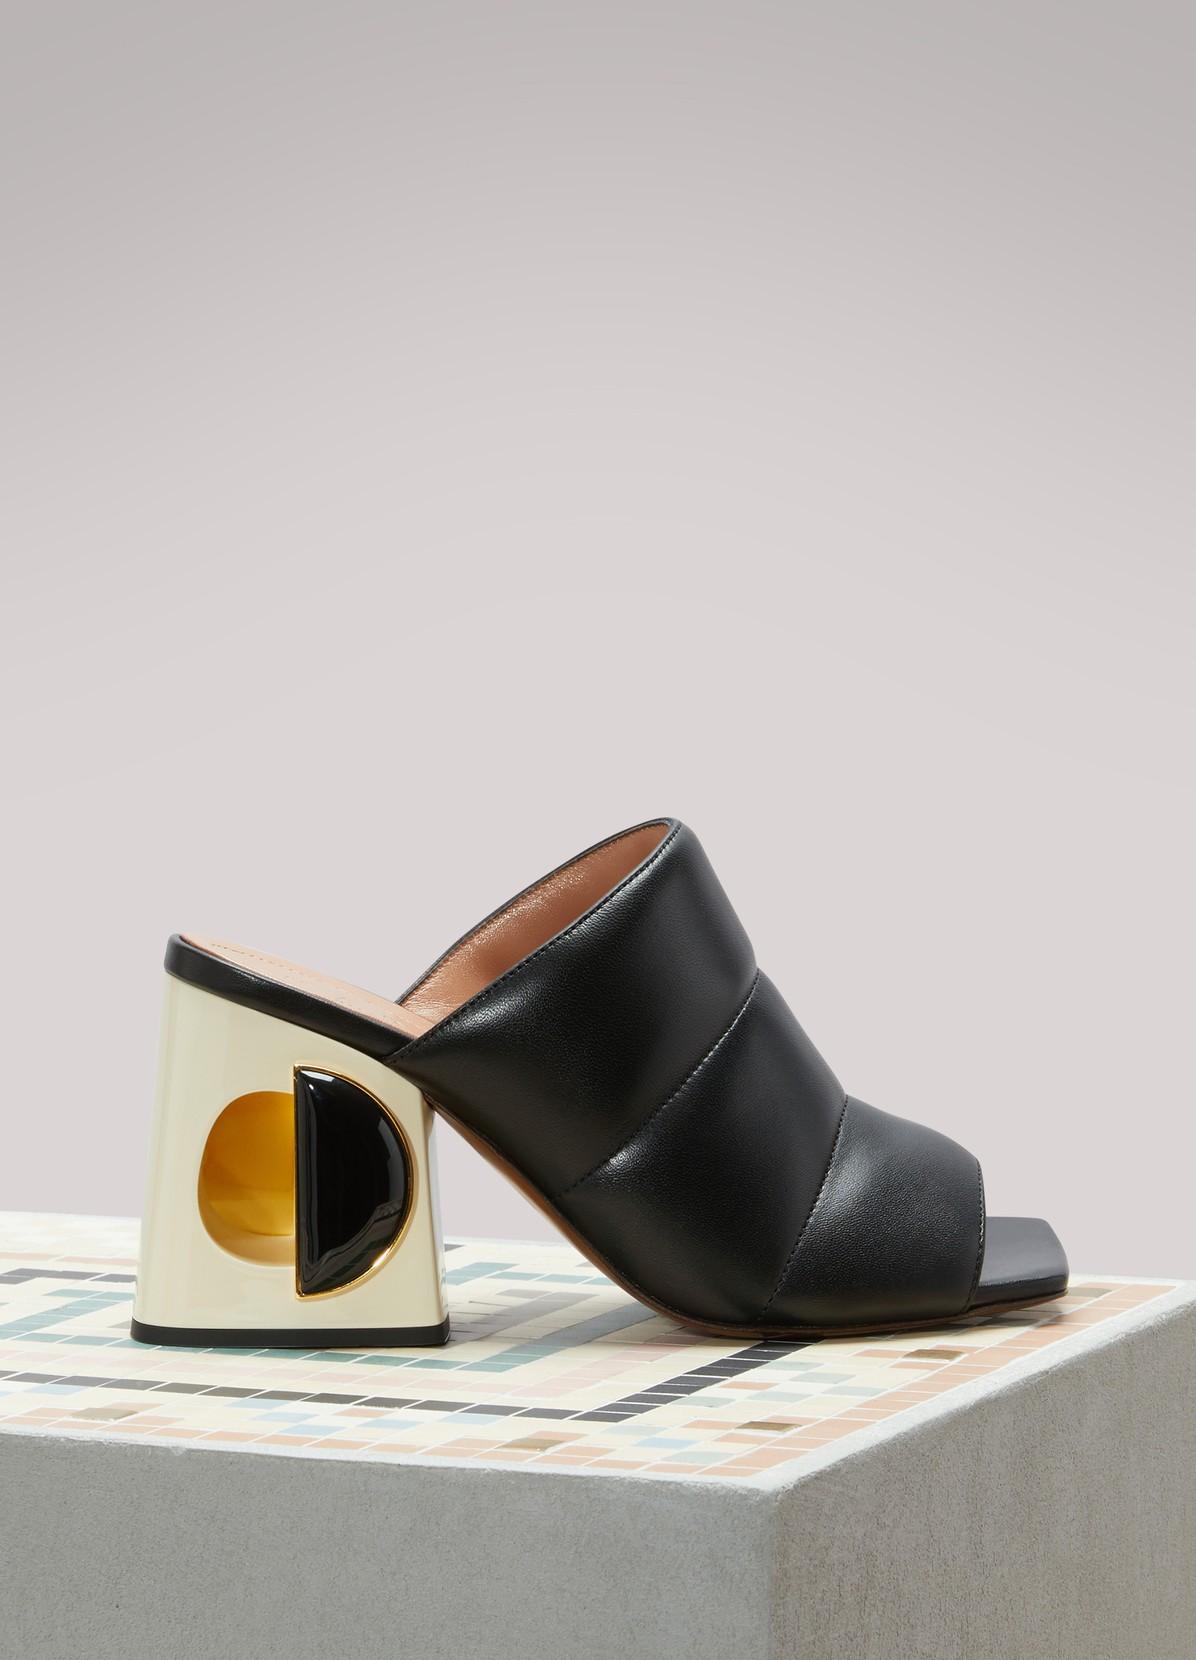 High heel black leather mules